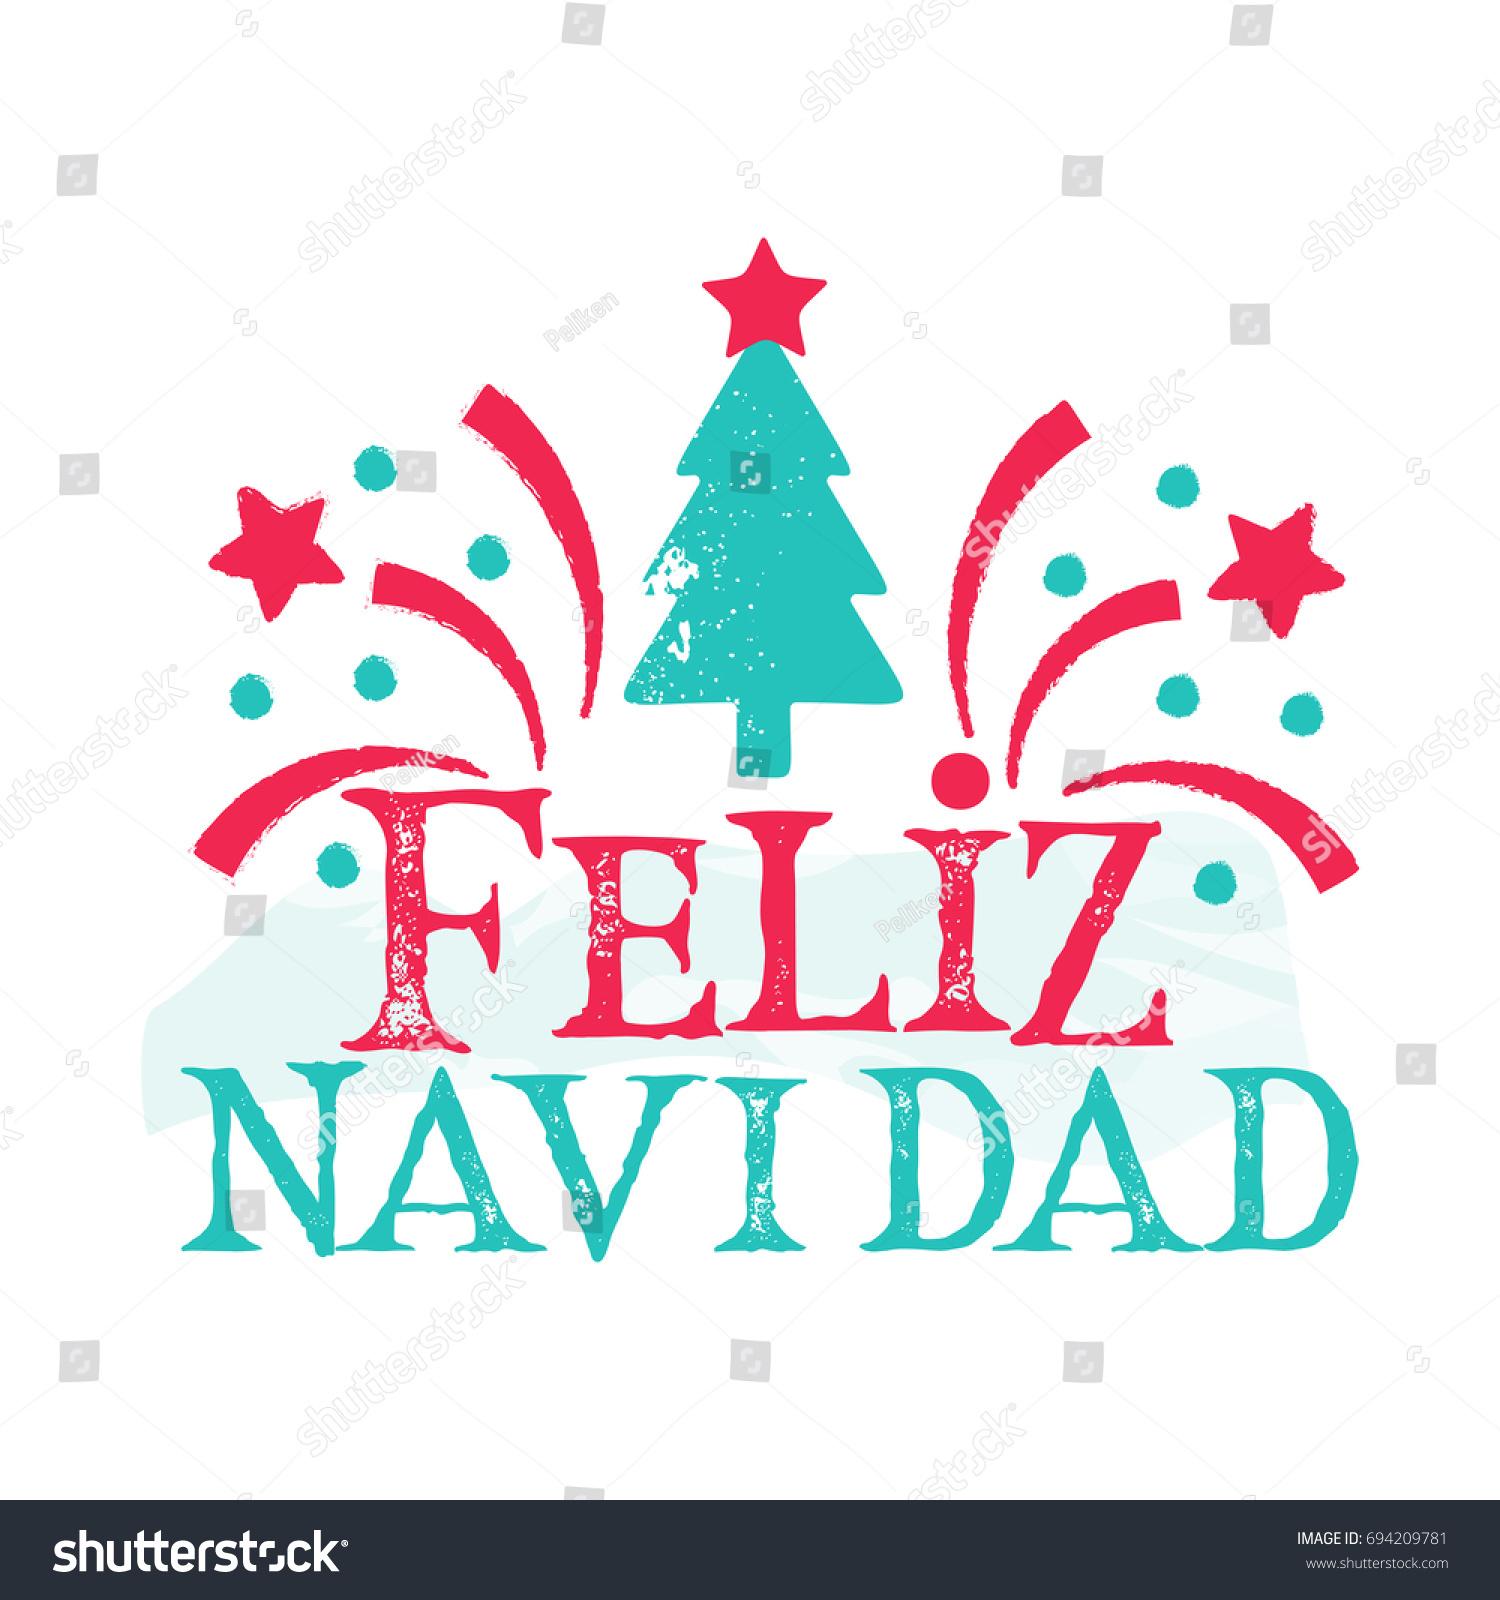 stock vector feliz navidad merry christmas spanish language happy new year card with tree and fireworks 694209781